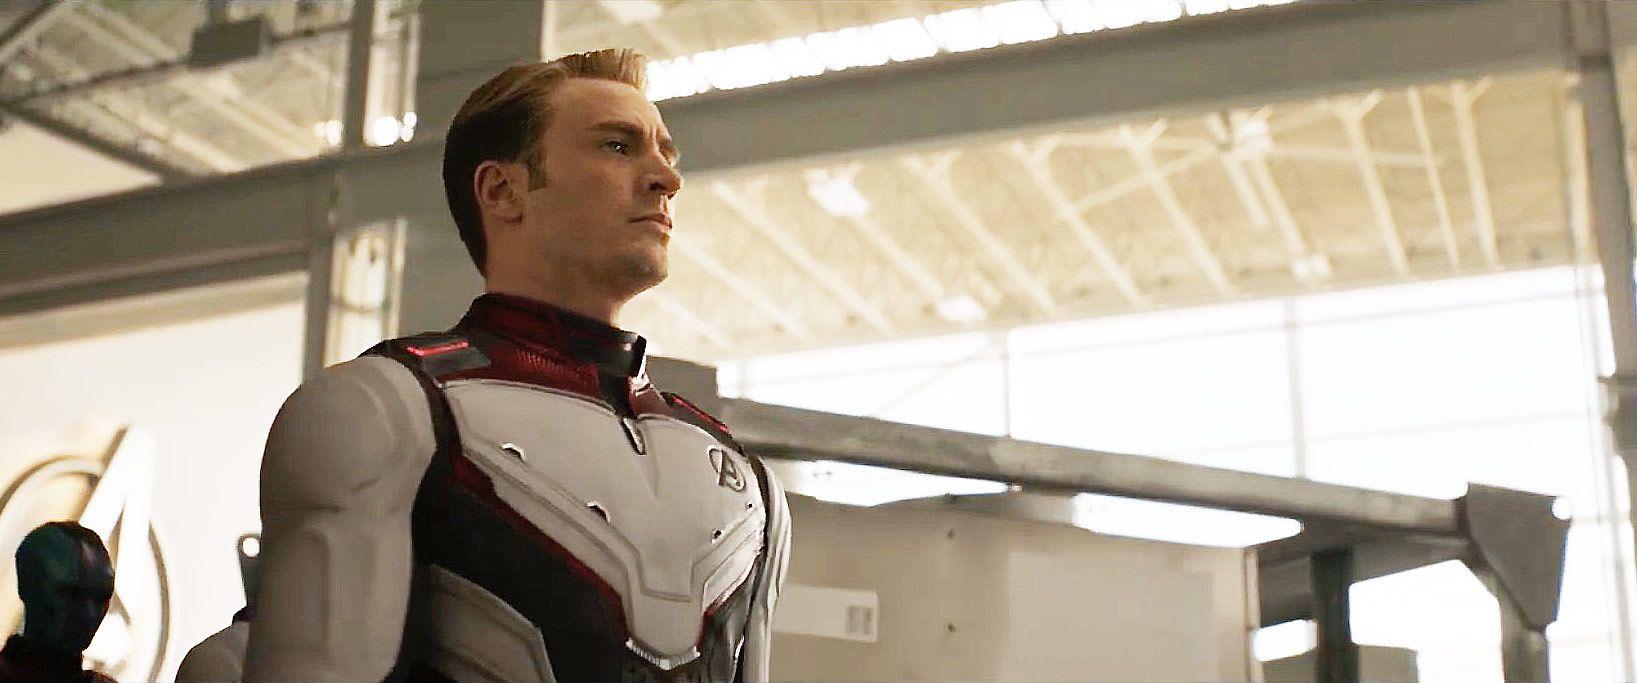 Avengers Endgame – How Captain America's epic moment is even